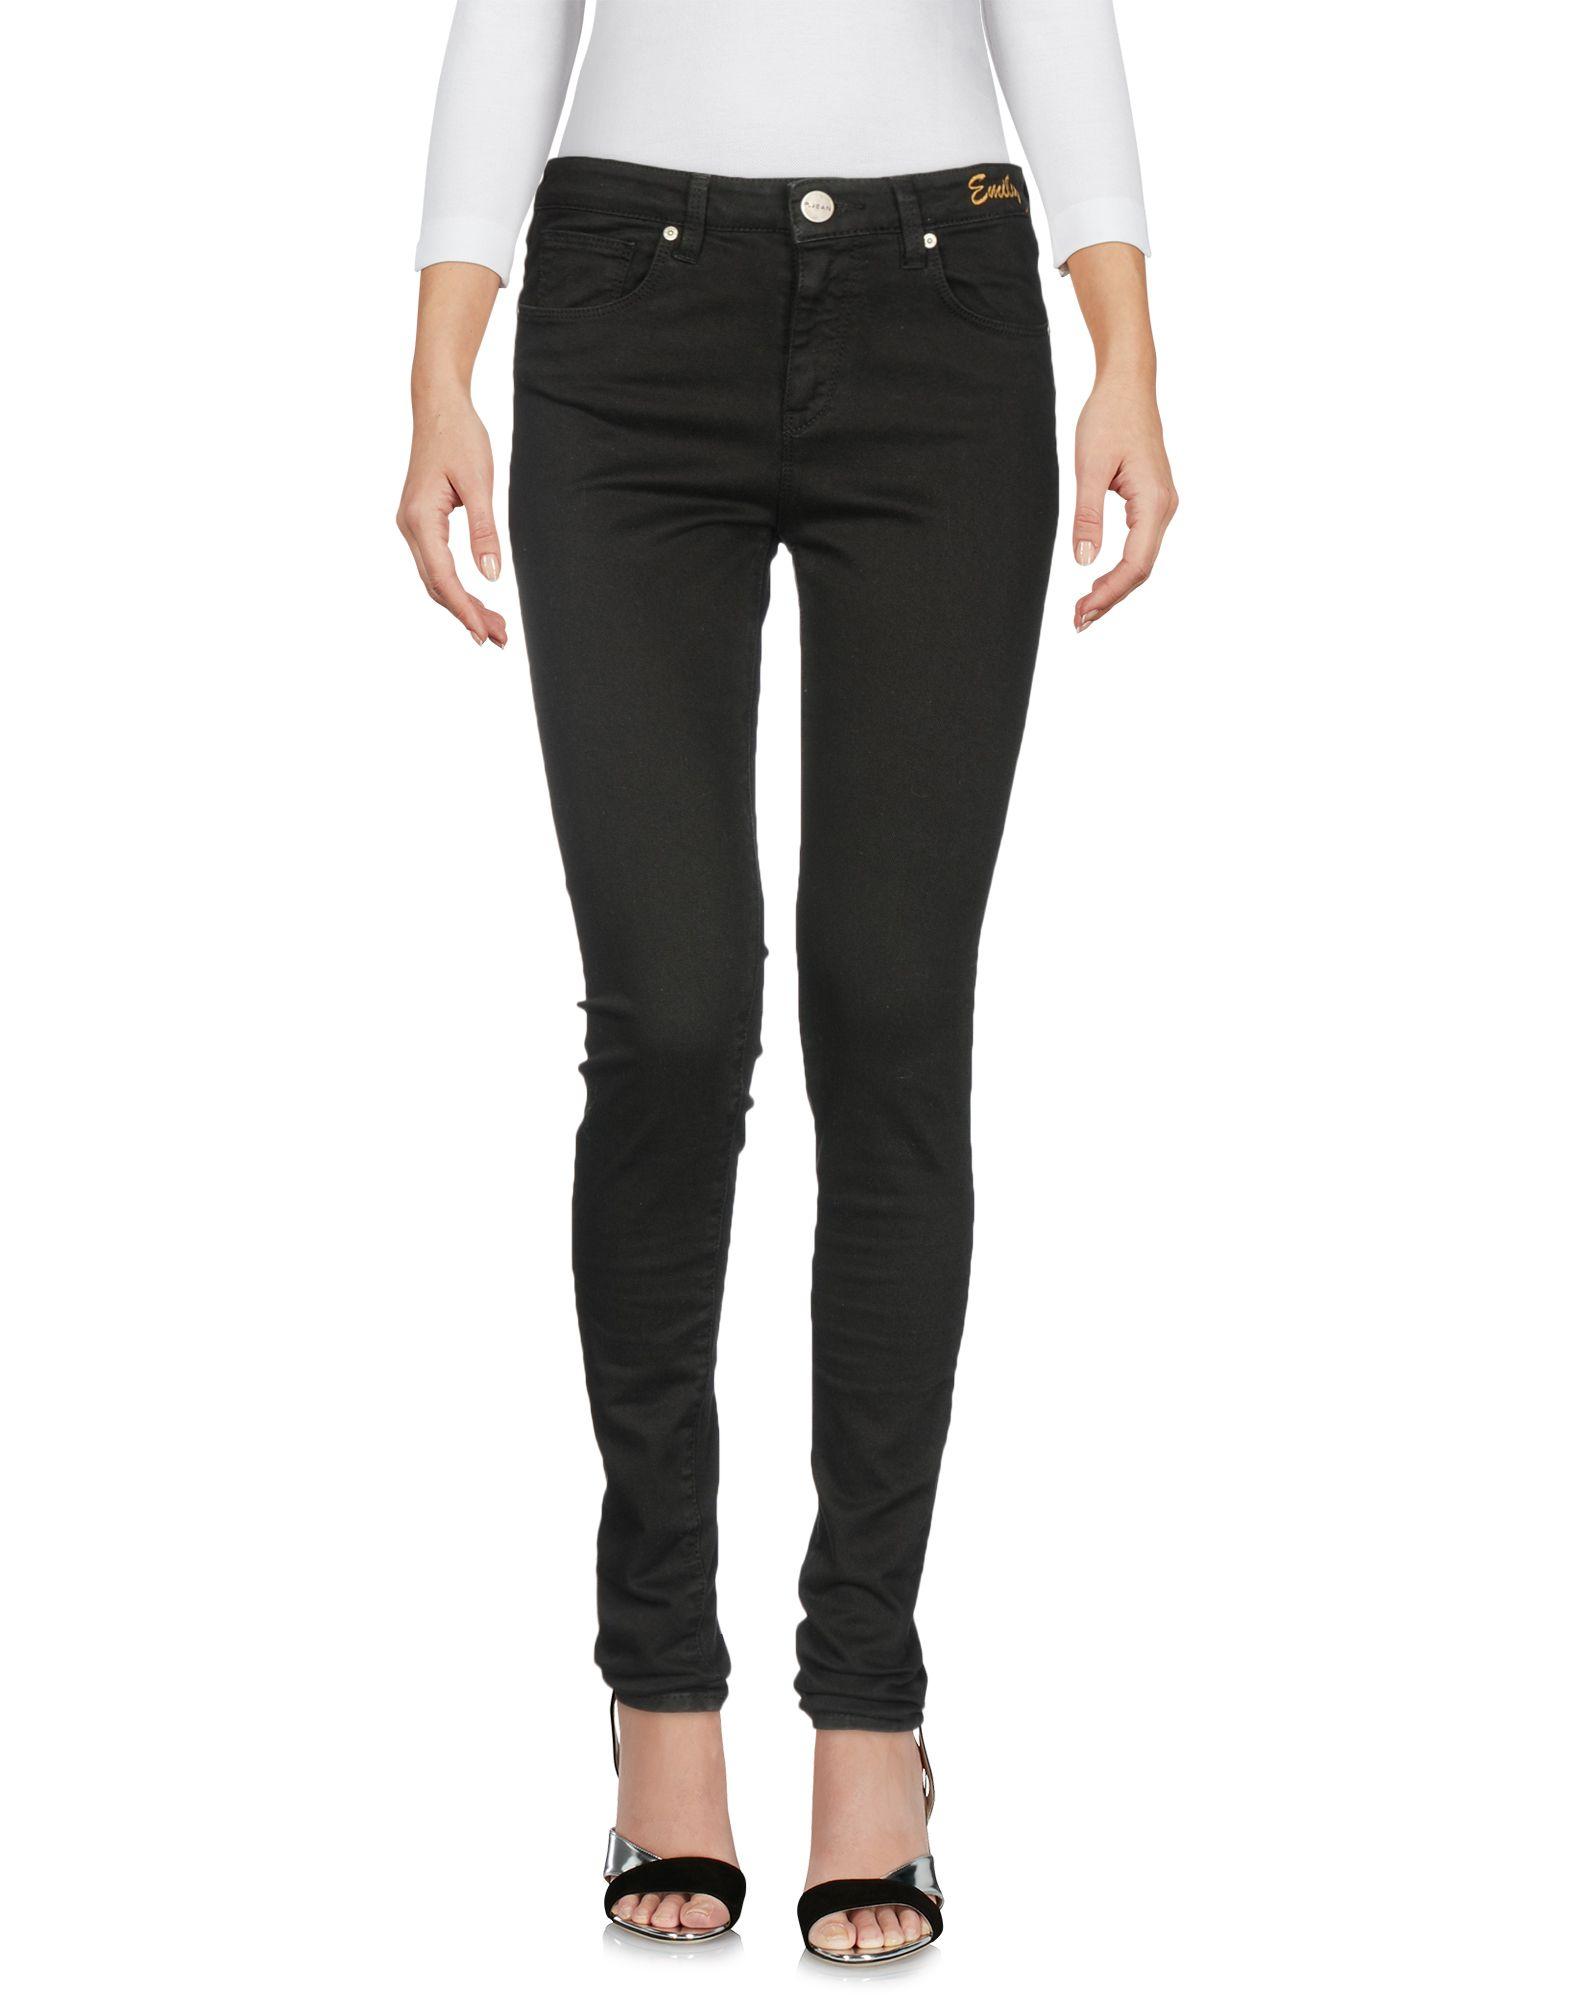 P_JEAN Джинсовые брюки carver pioneer camp джинсовые брюки мужские обычные джинсовые брюки темно синий 33 611 021